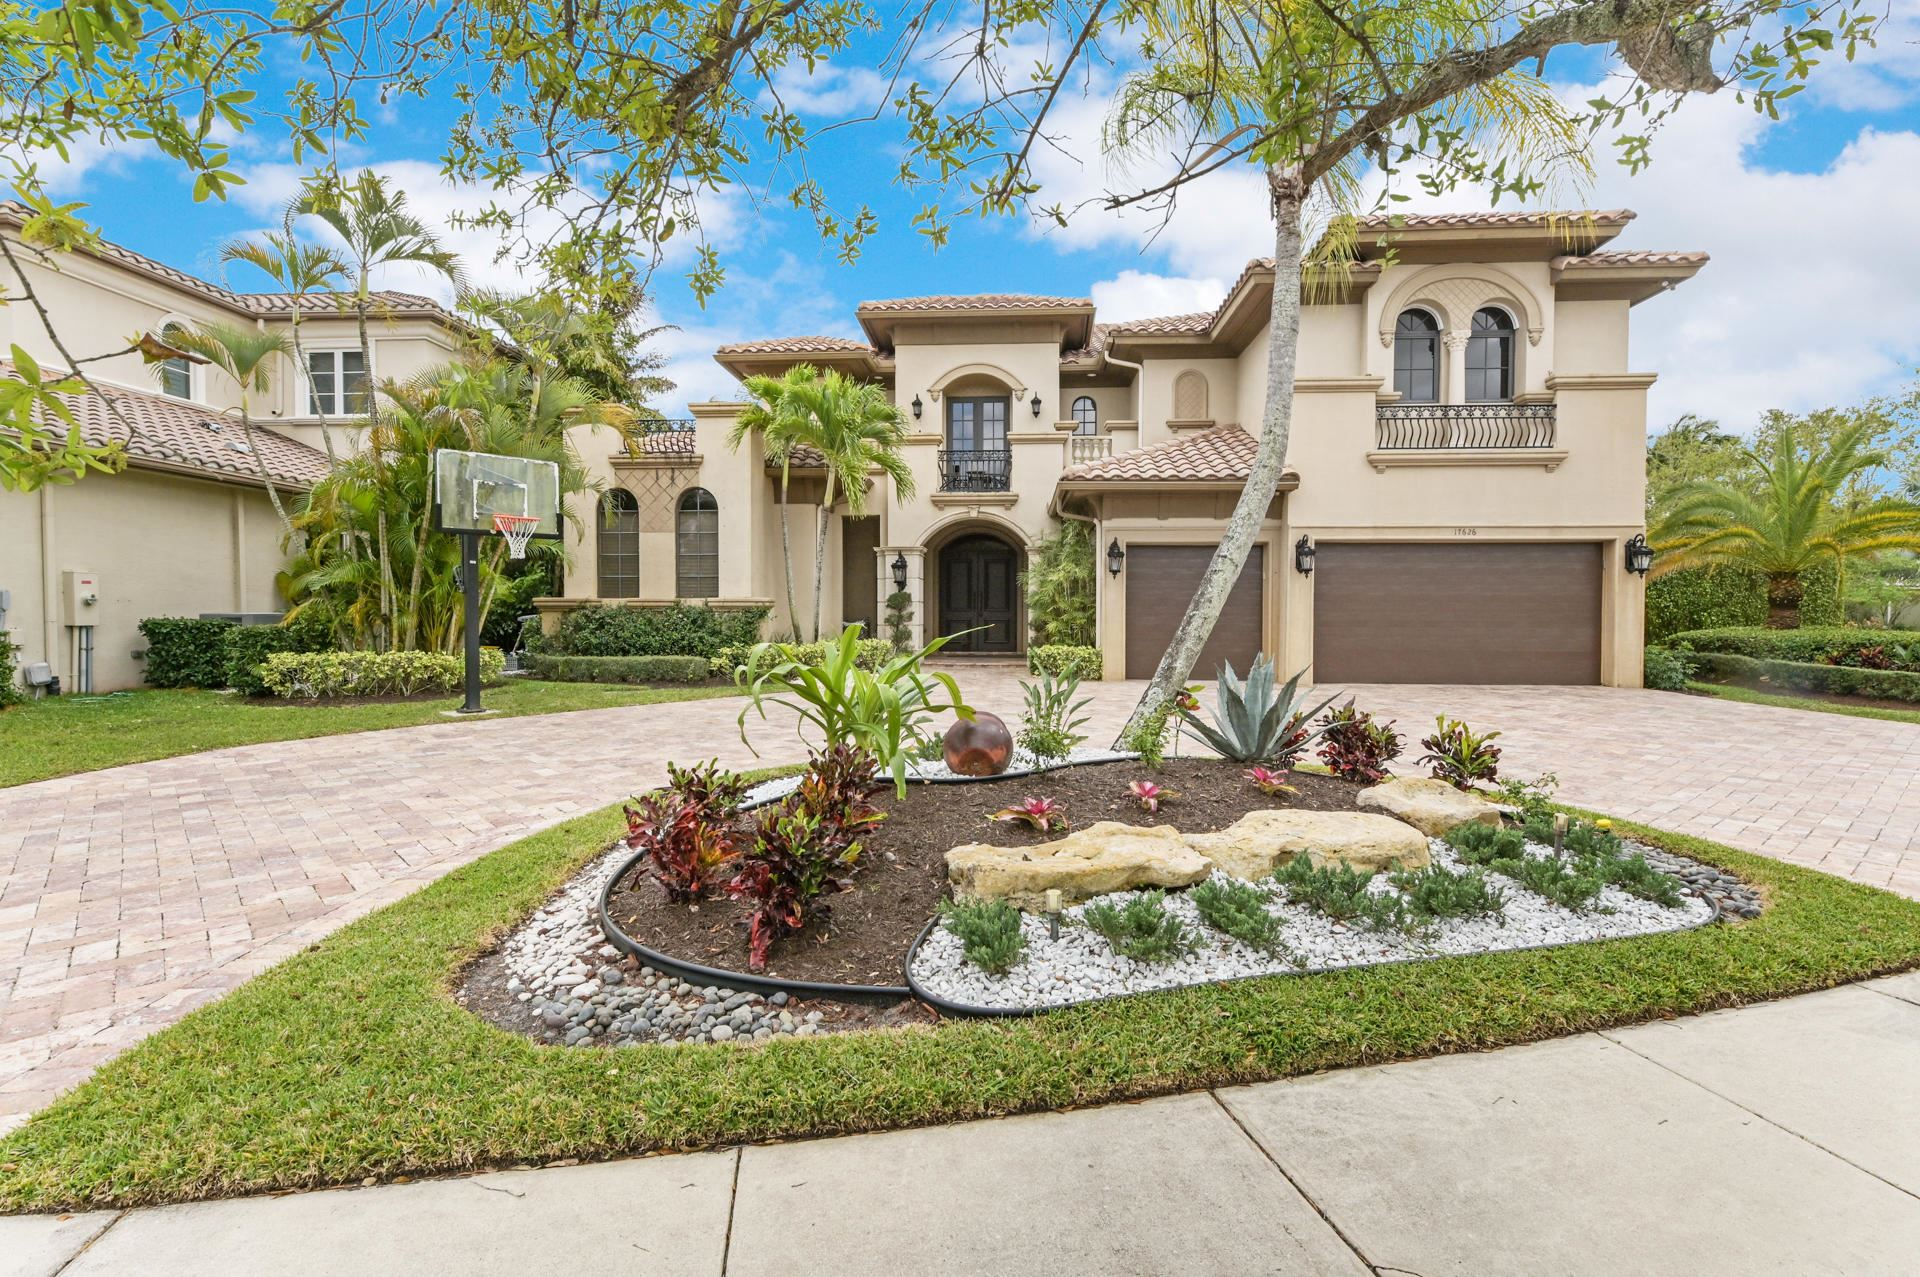 17626 Middlebrook Way, Boca Raton, FL 33496 - #: RX-10699763